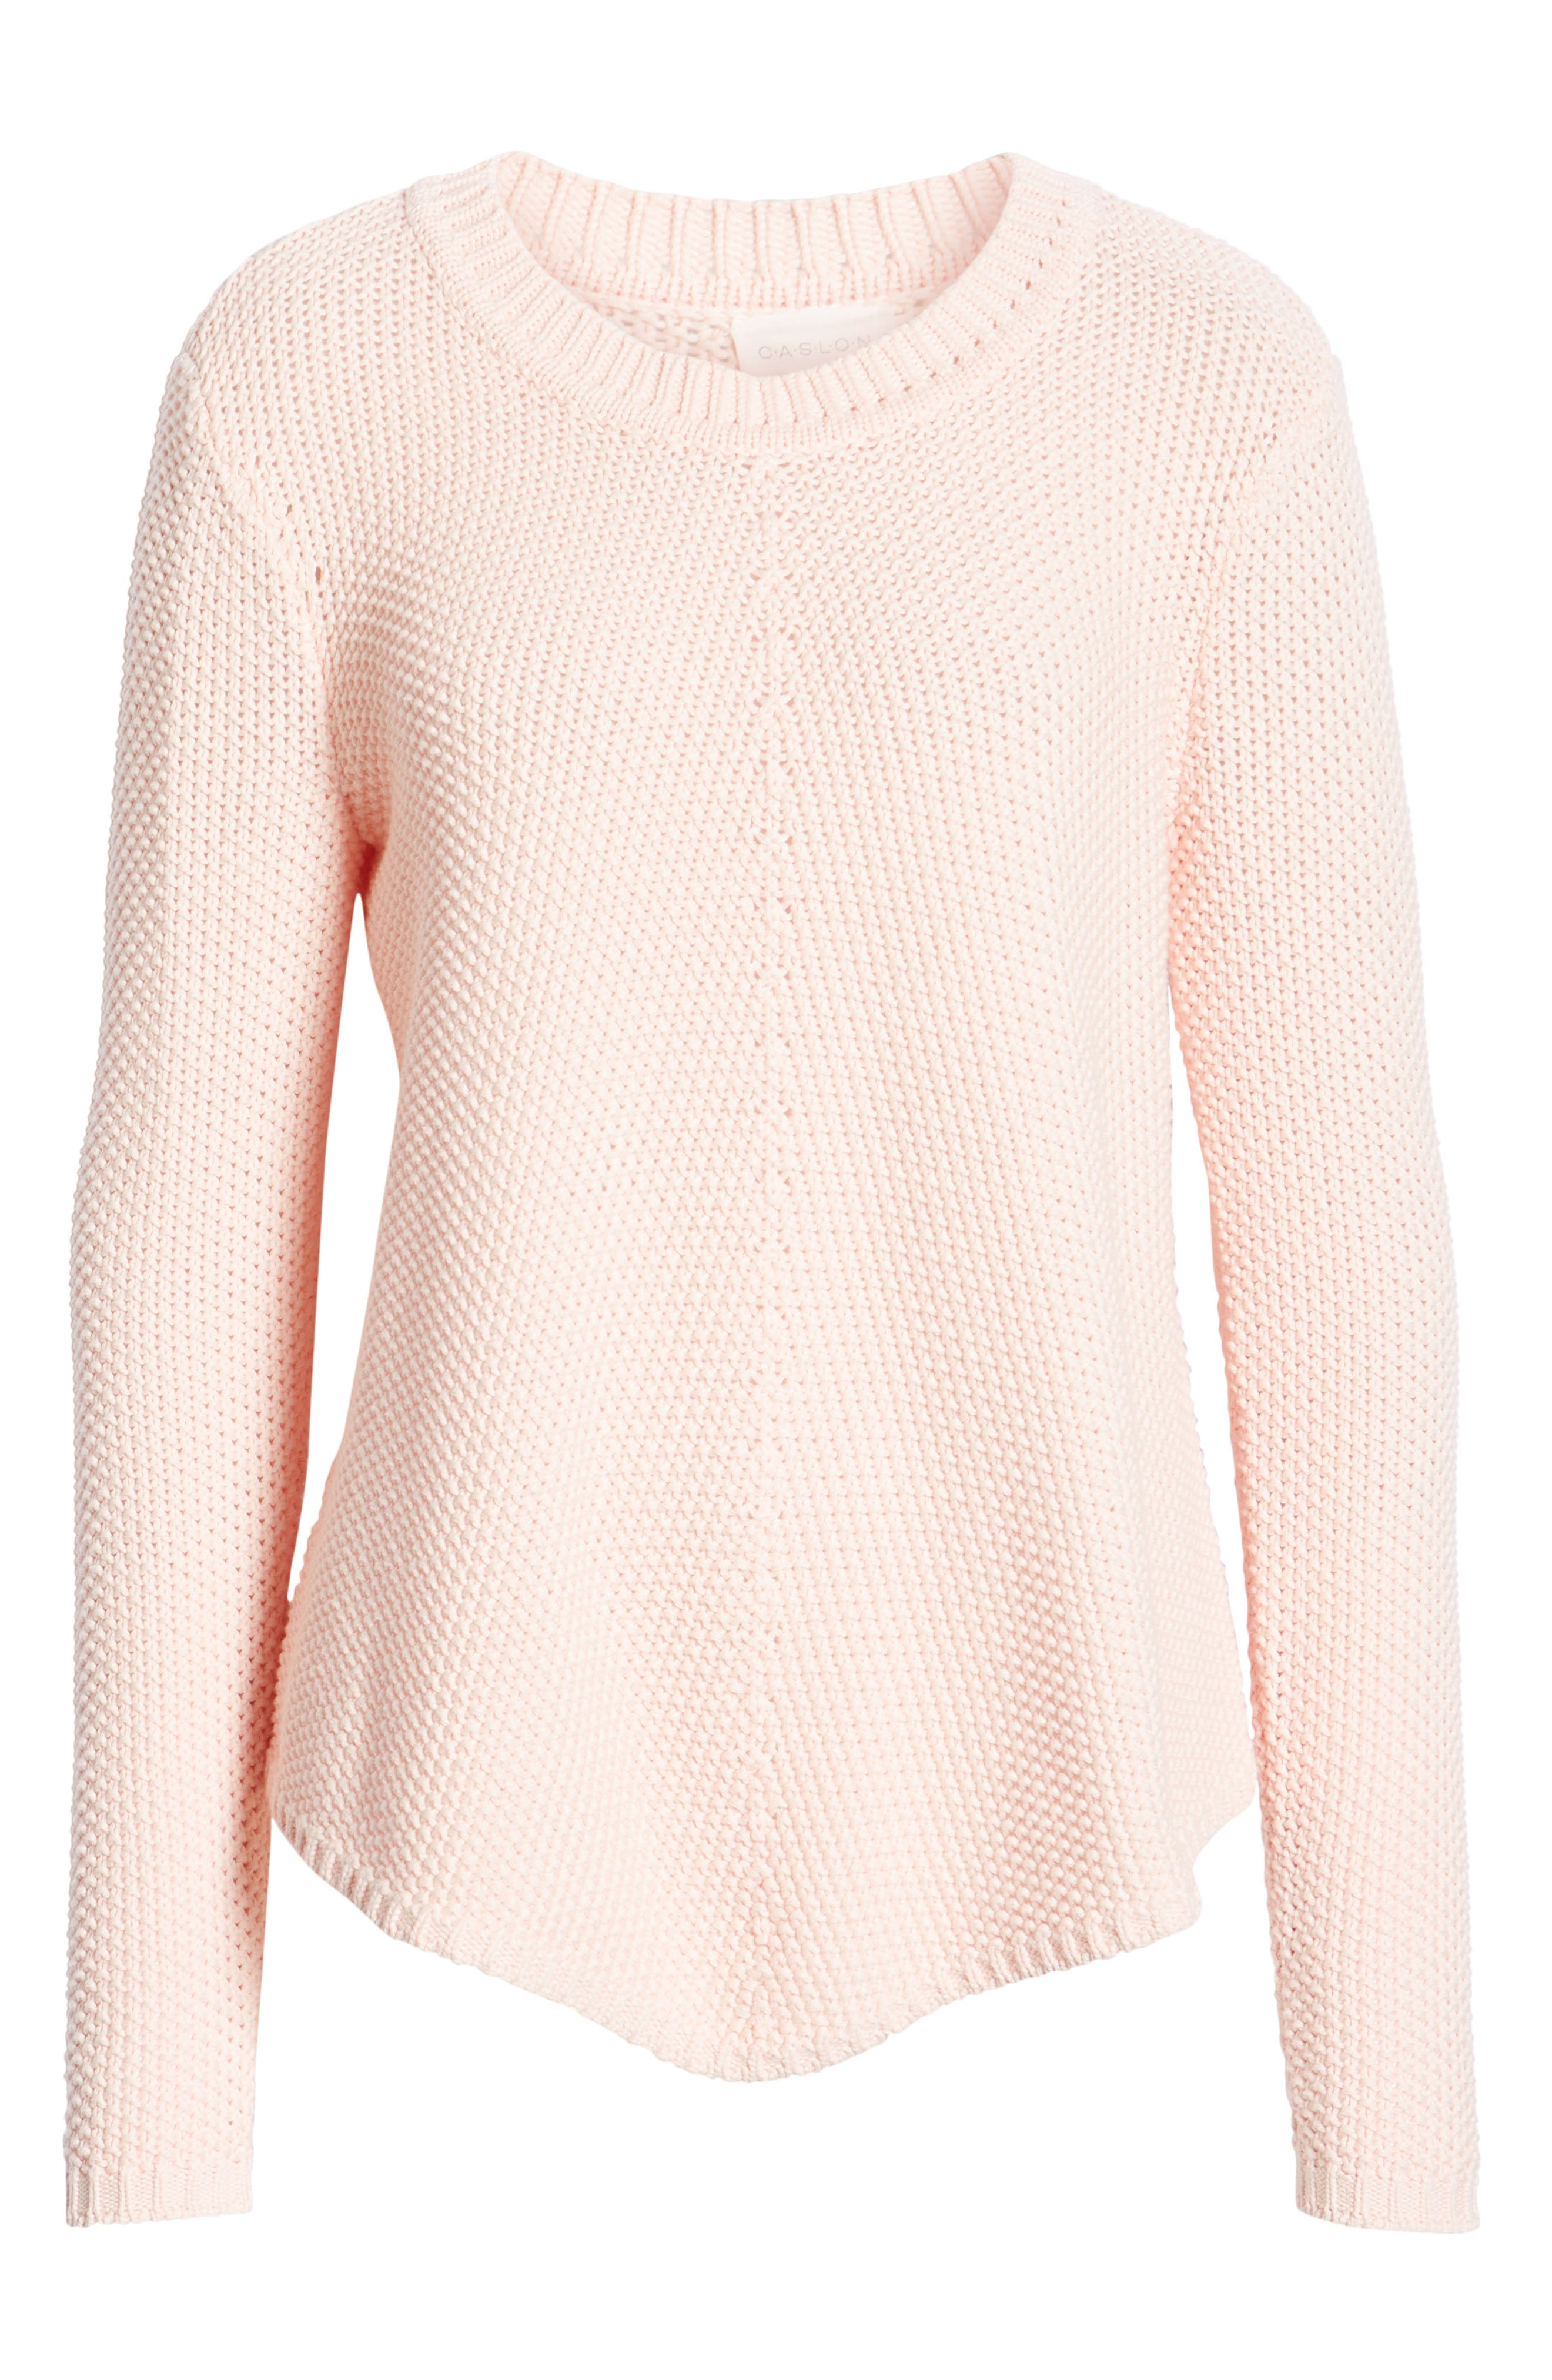 CASLON<SUP>®</SUP>,                             Stitch Stripe Sweater,                             Alternate thumbnail 6, color,                             PINK CHINTZ